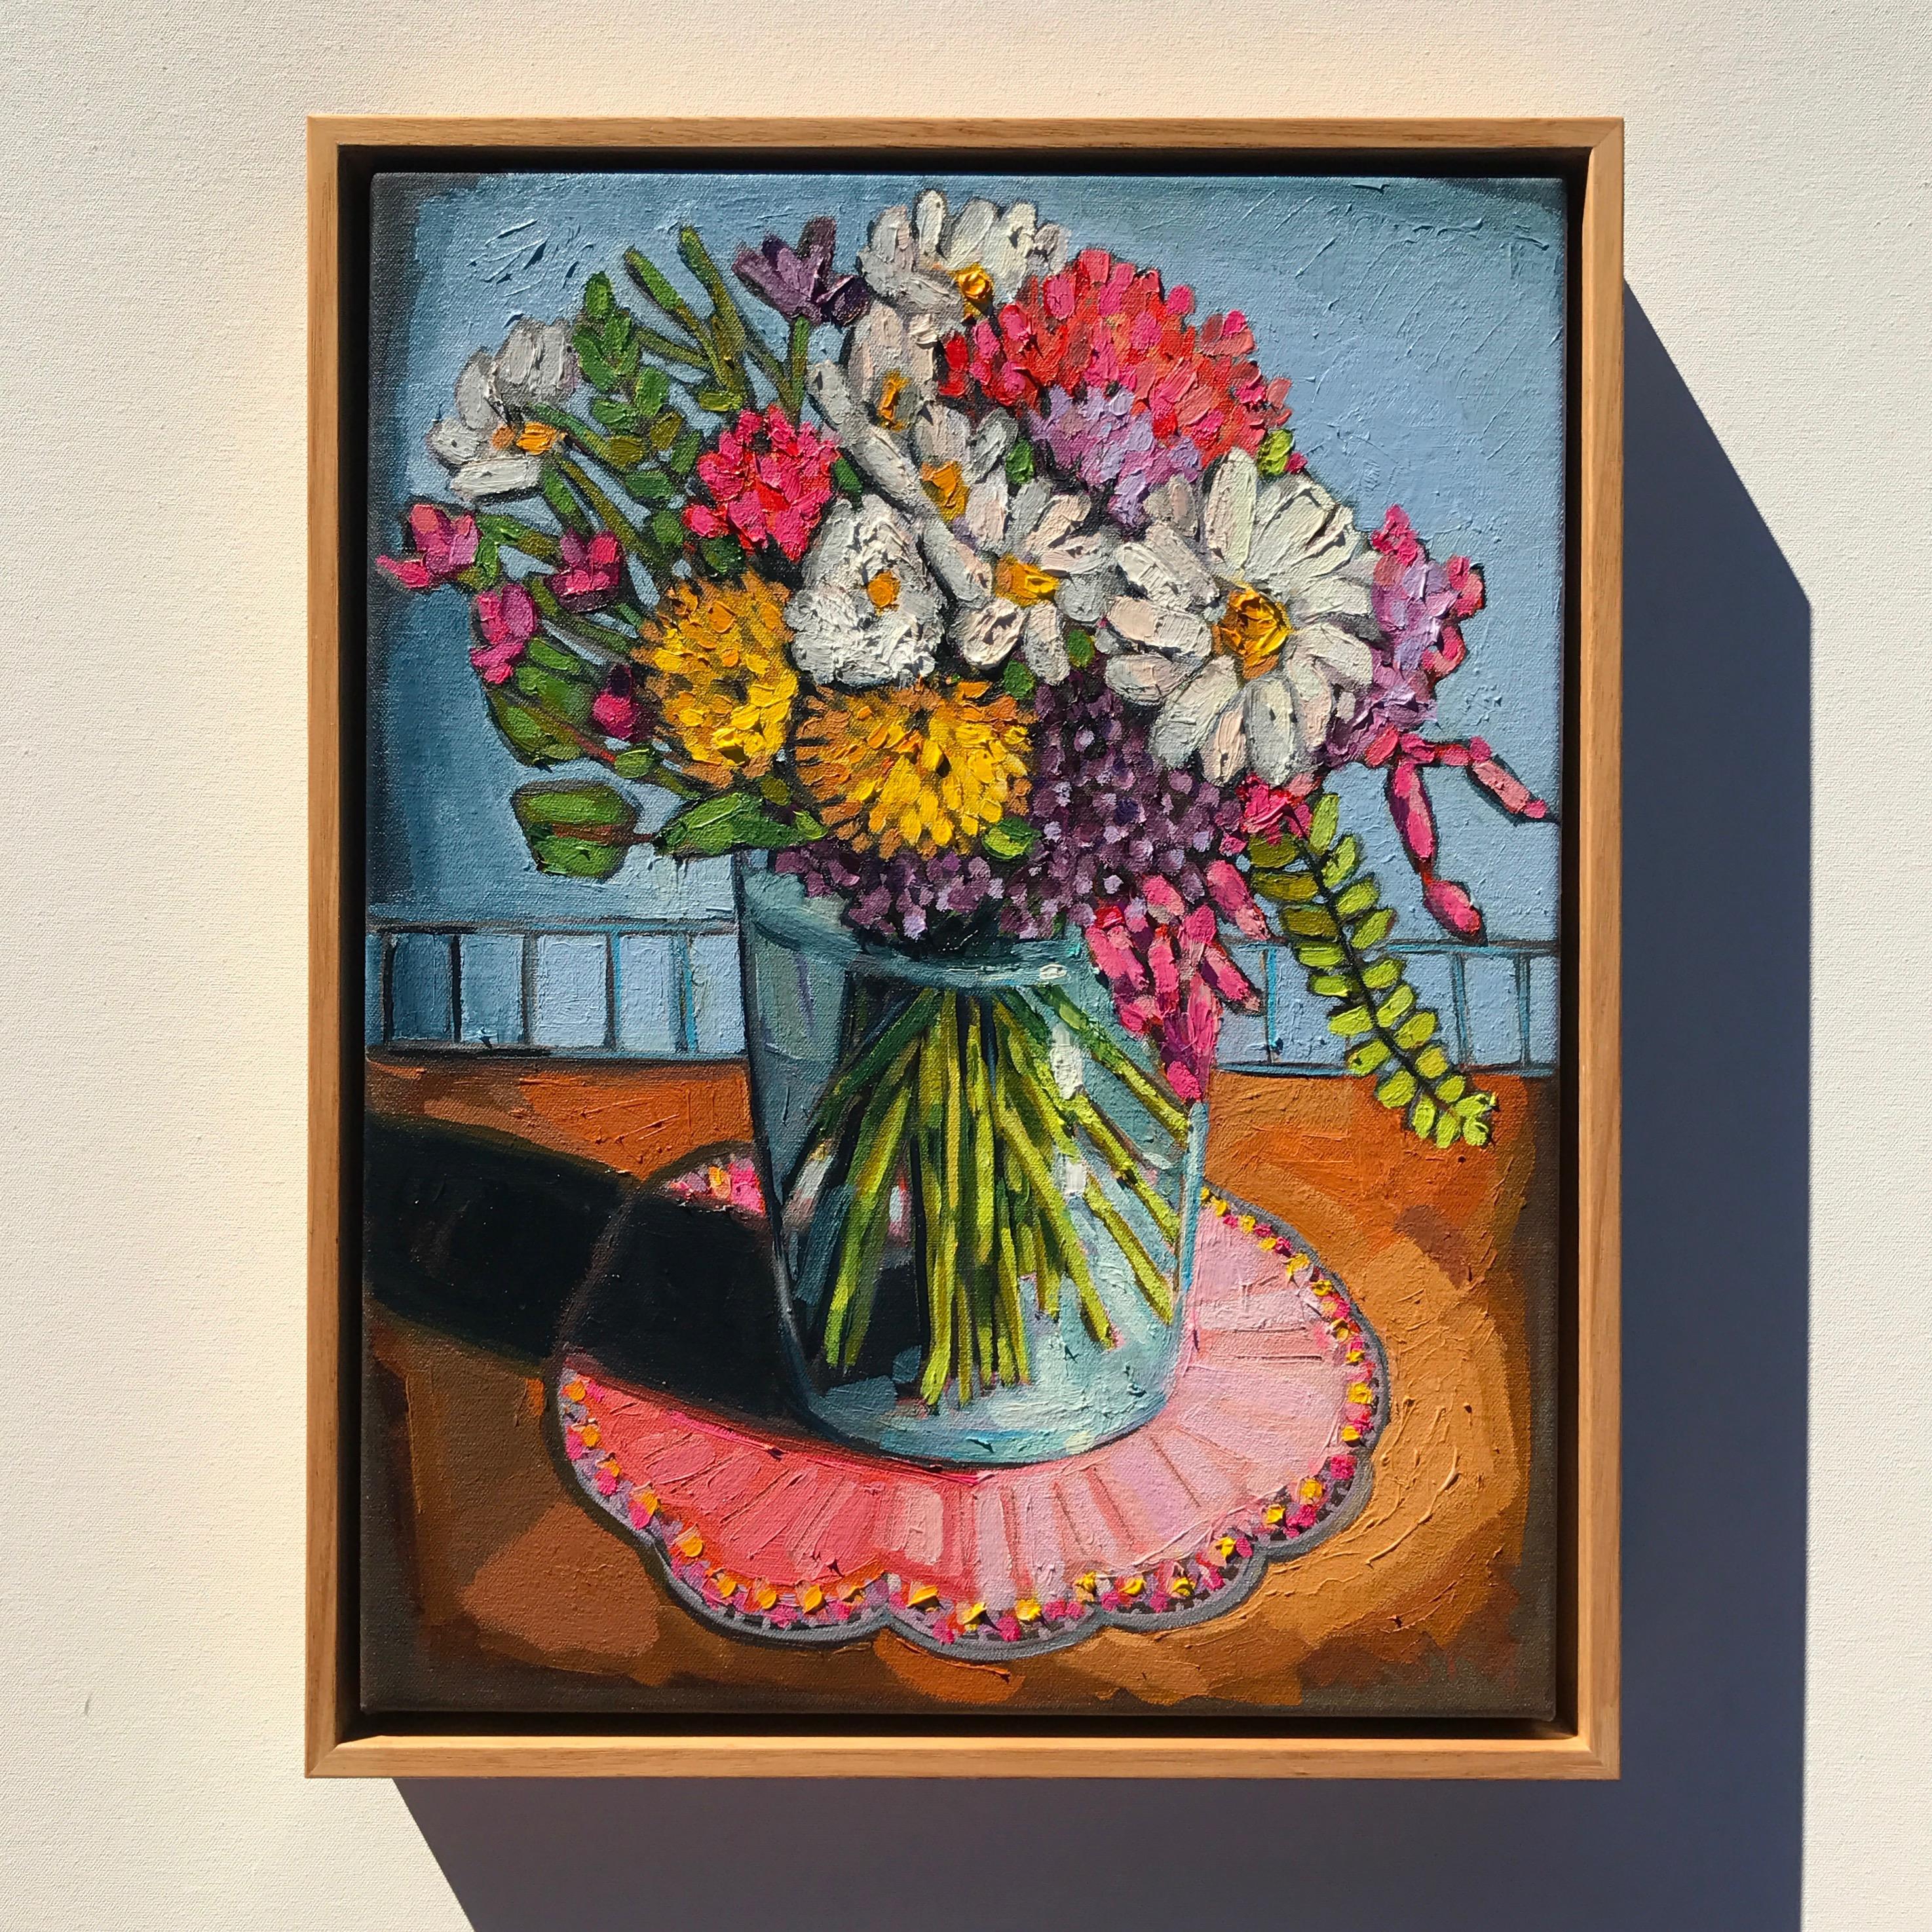 02_17 'Happy Bouquet' 39x49cm $795